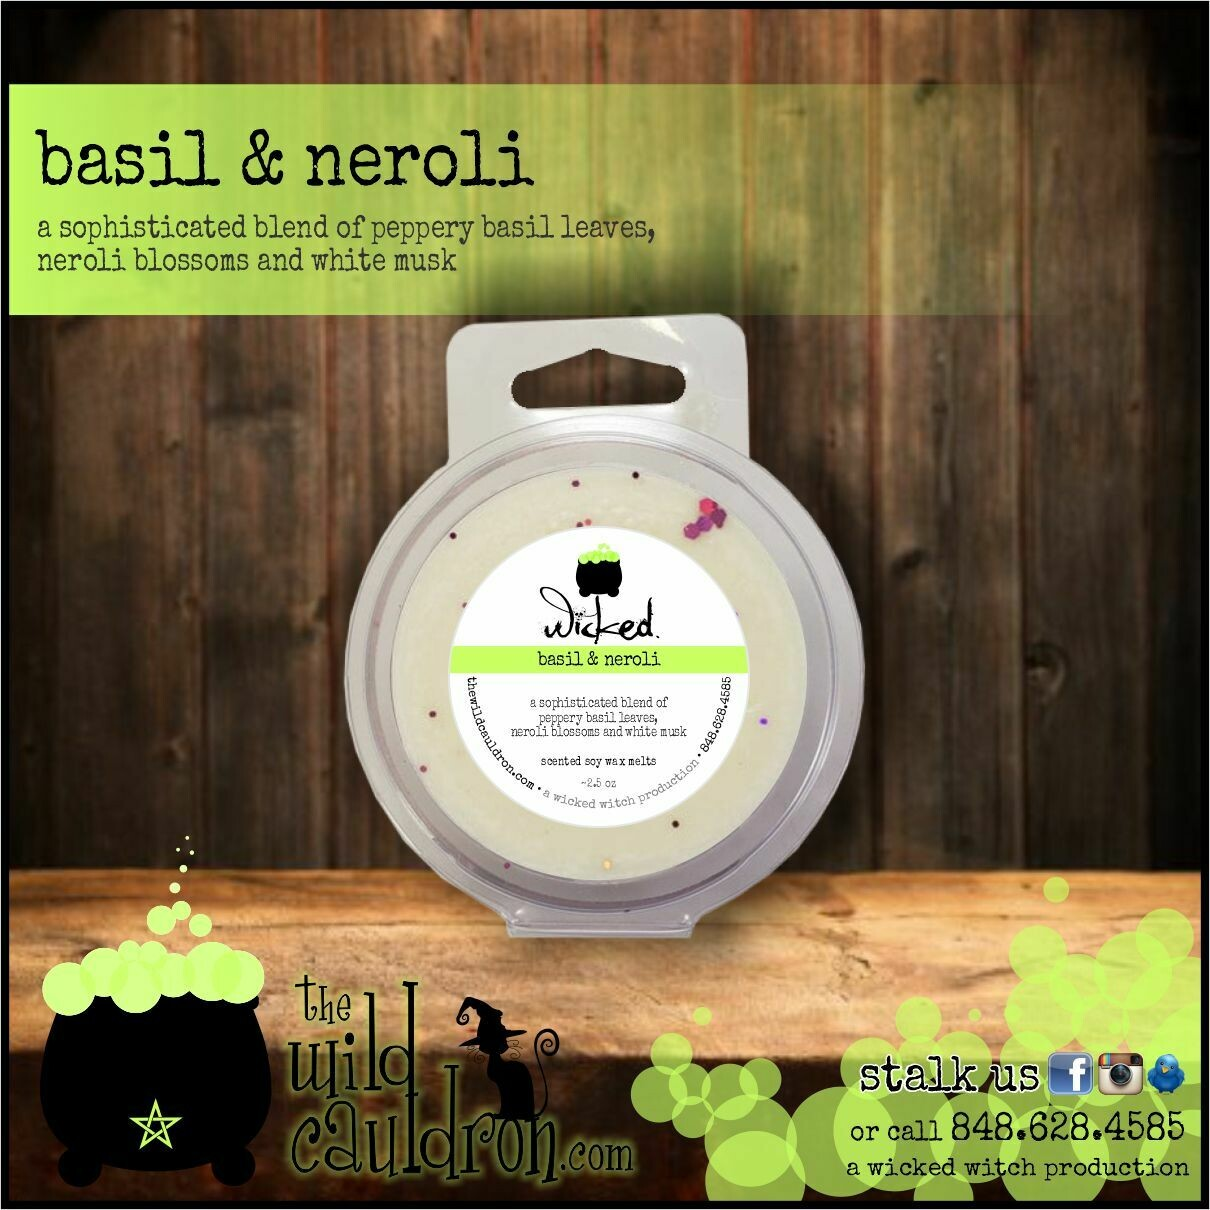 Basil and Neroli Wicked Wax Melts